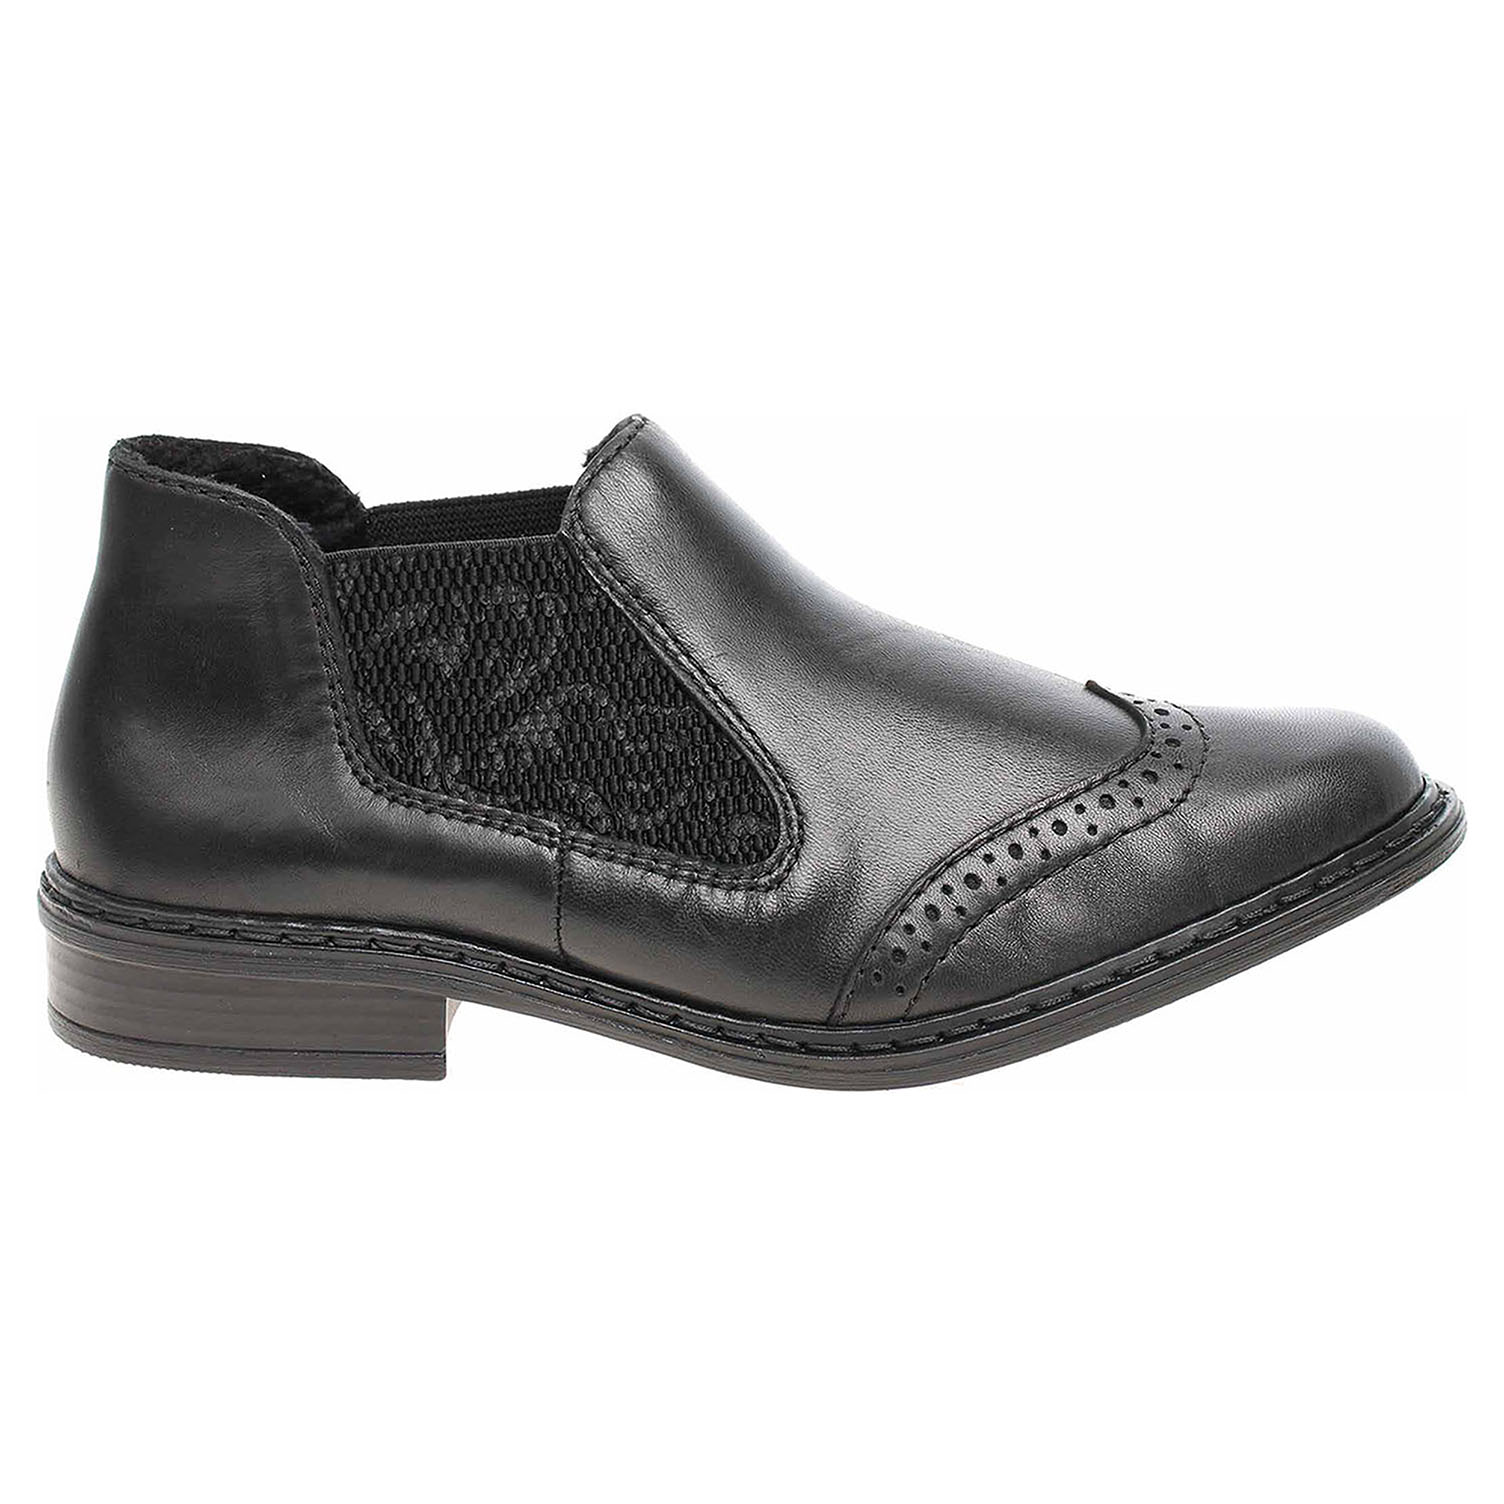 Rieker dámská obuv 52093-00 schwarz 52093-00 39